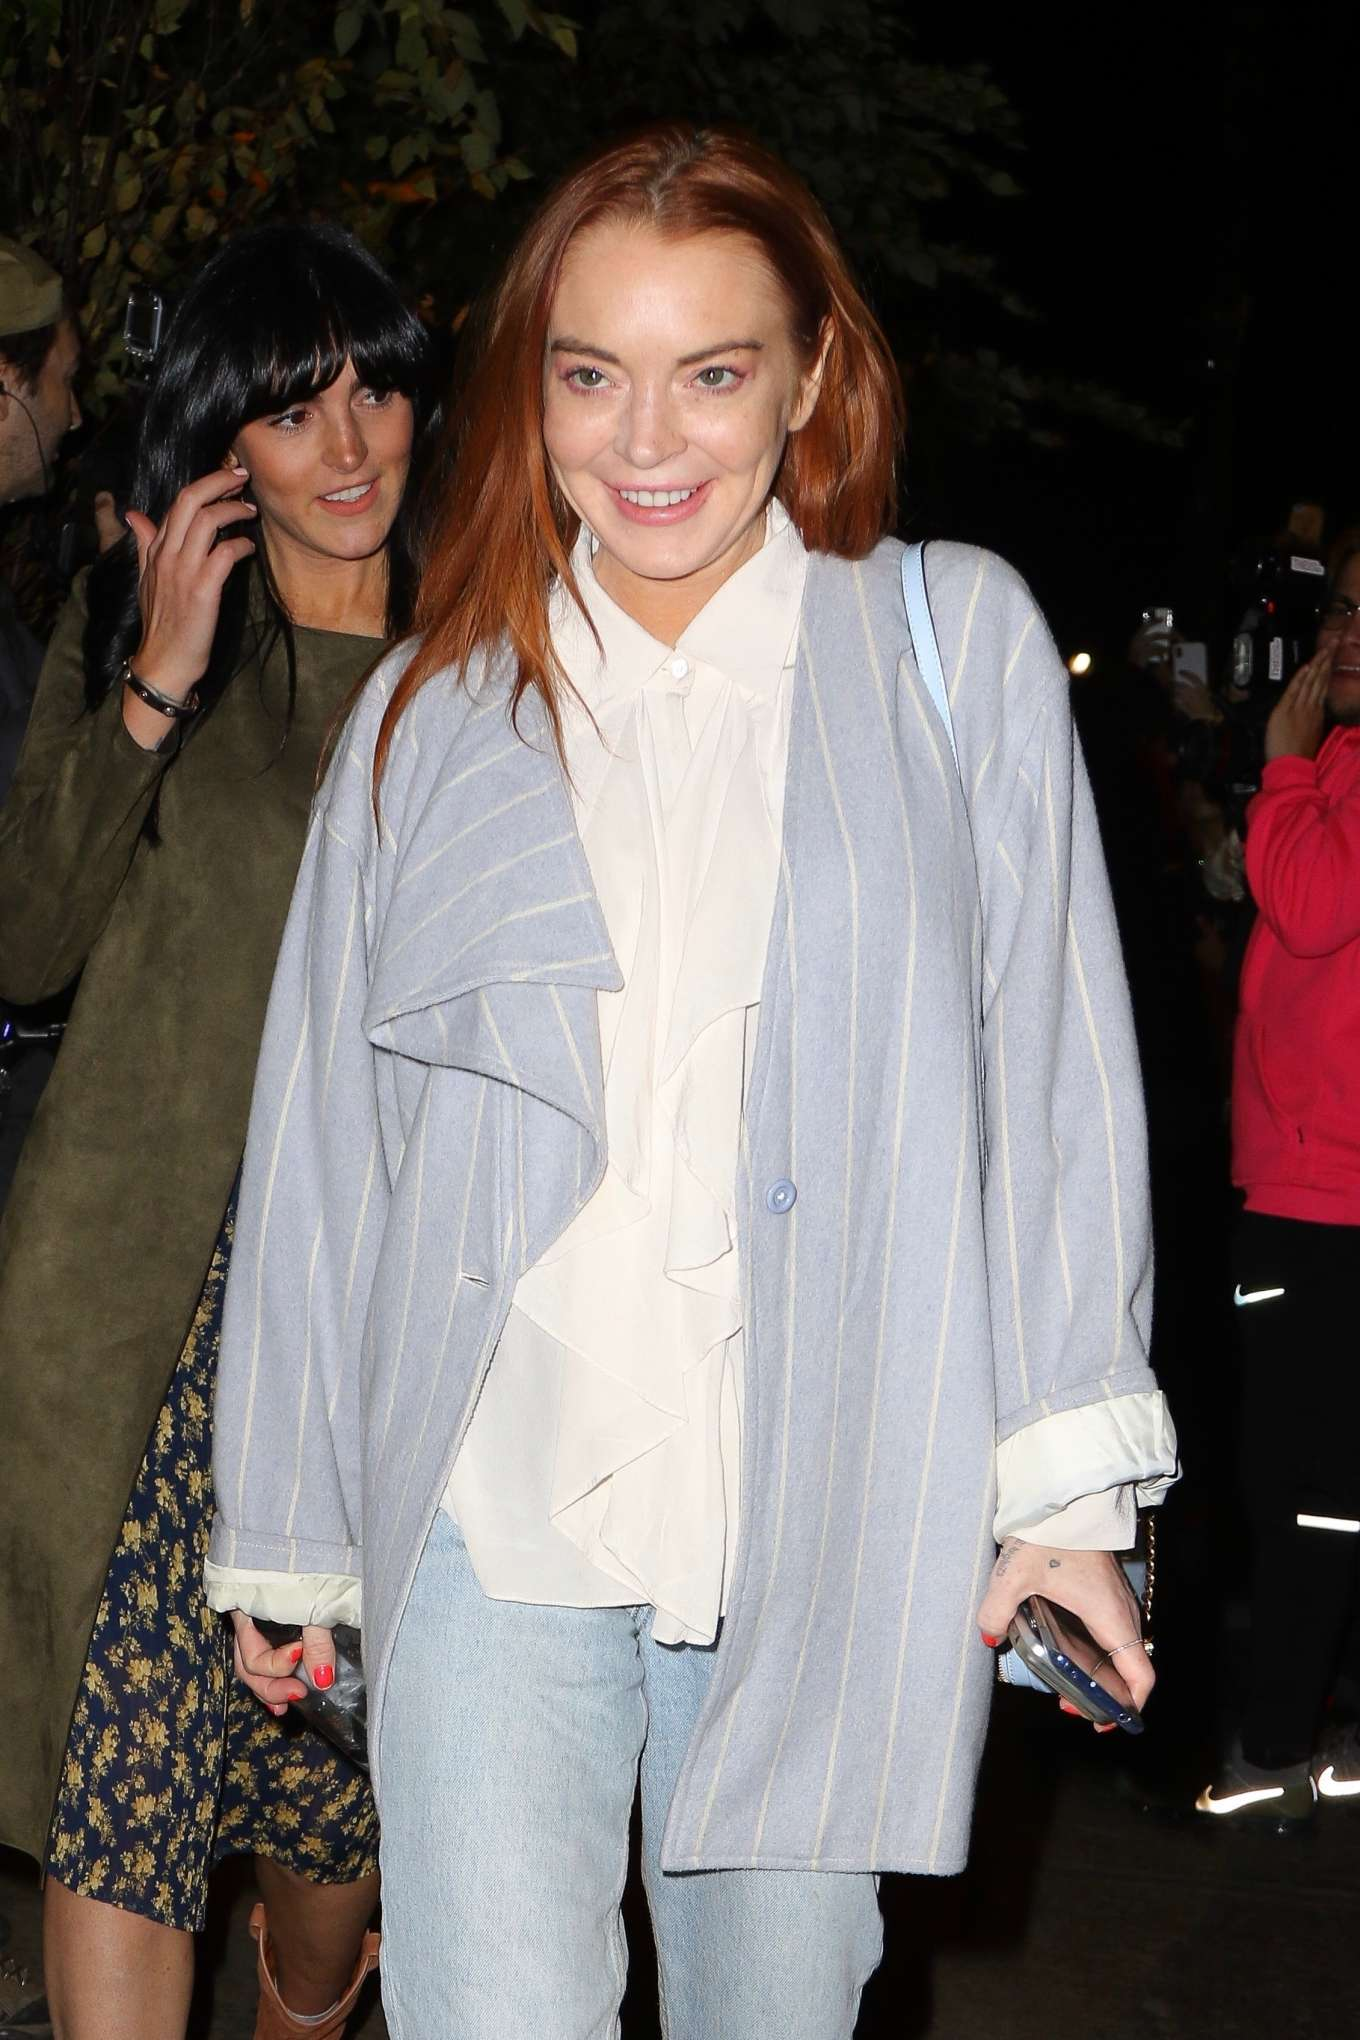 Lindsay Lohan in Jeans - Leaving the Mercer Hotel in New York